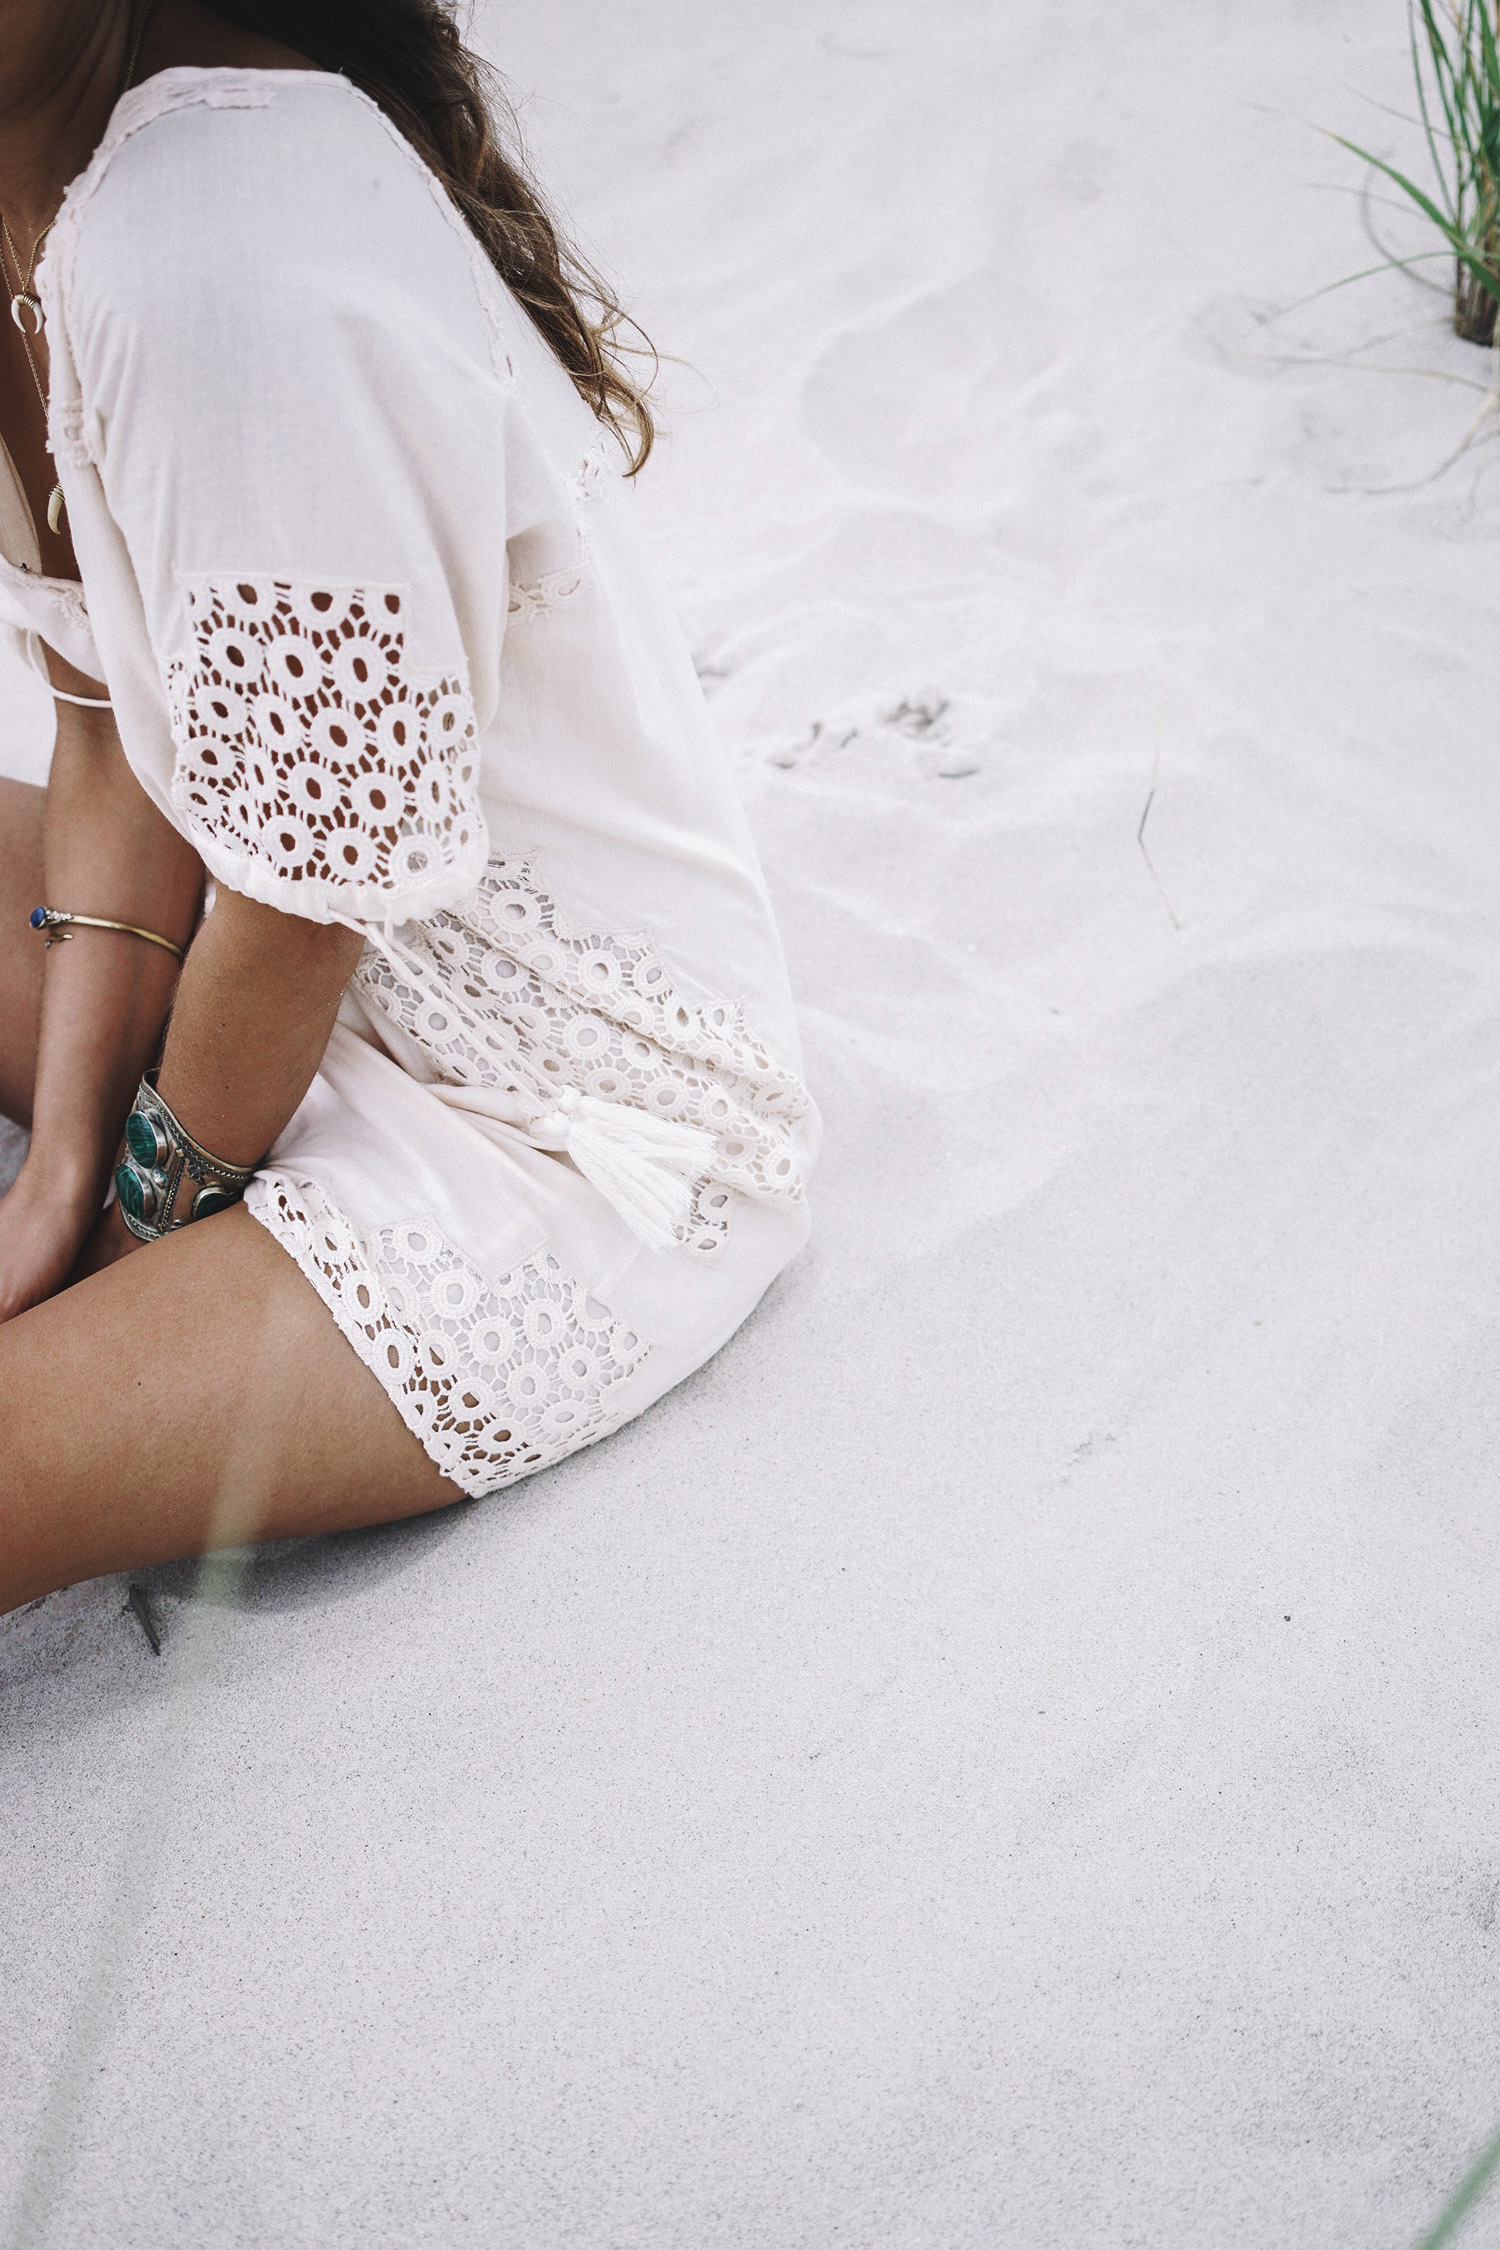 Revolve_in_The_Hamptons-Revolve_Clothing-Collage_Vintage-Cream_Dress-Tularosa-Canotier-136